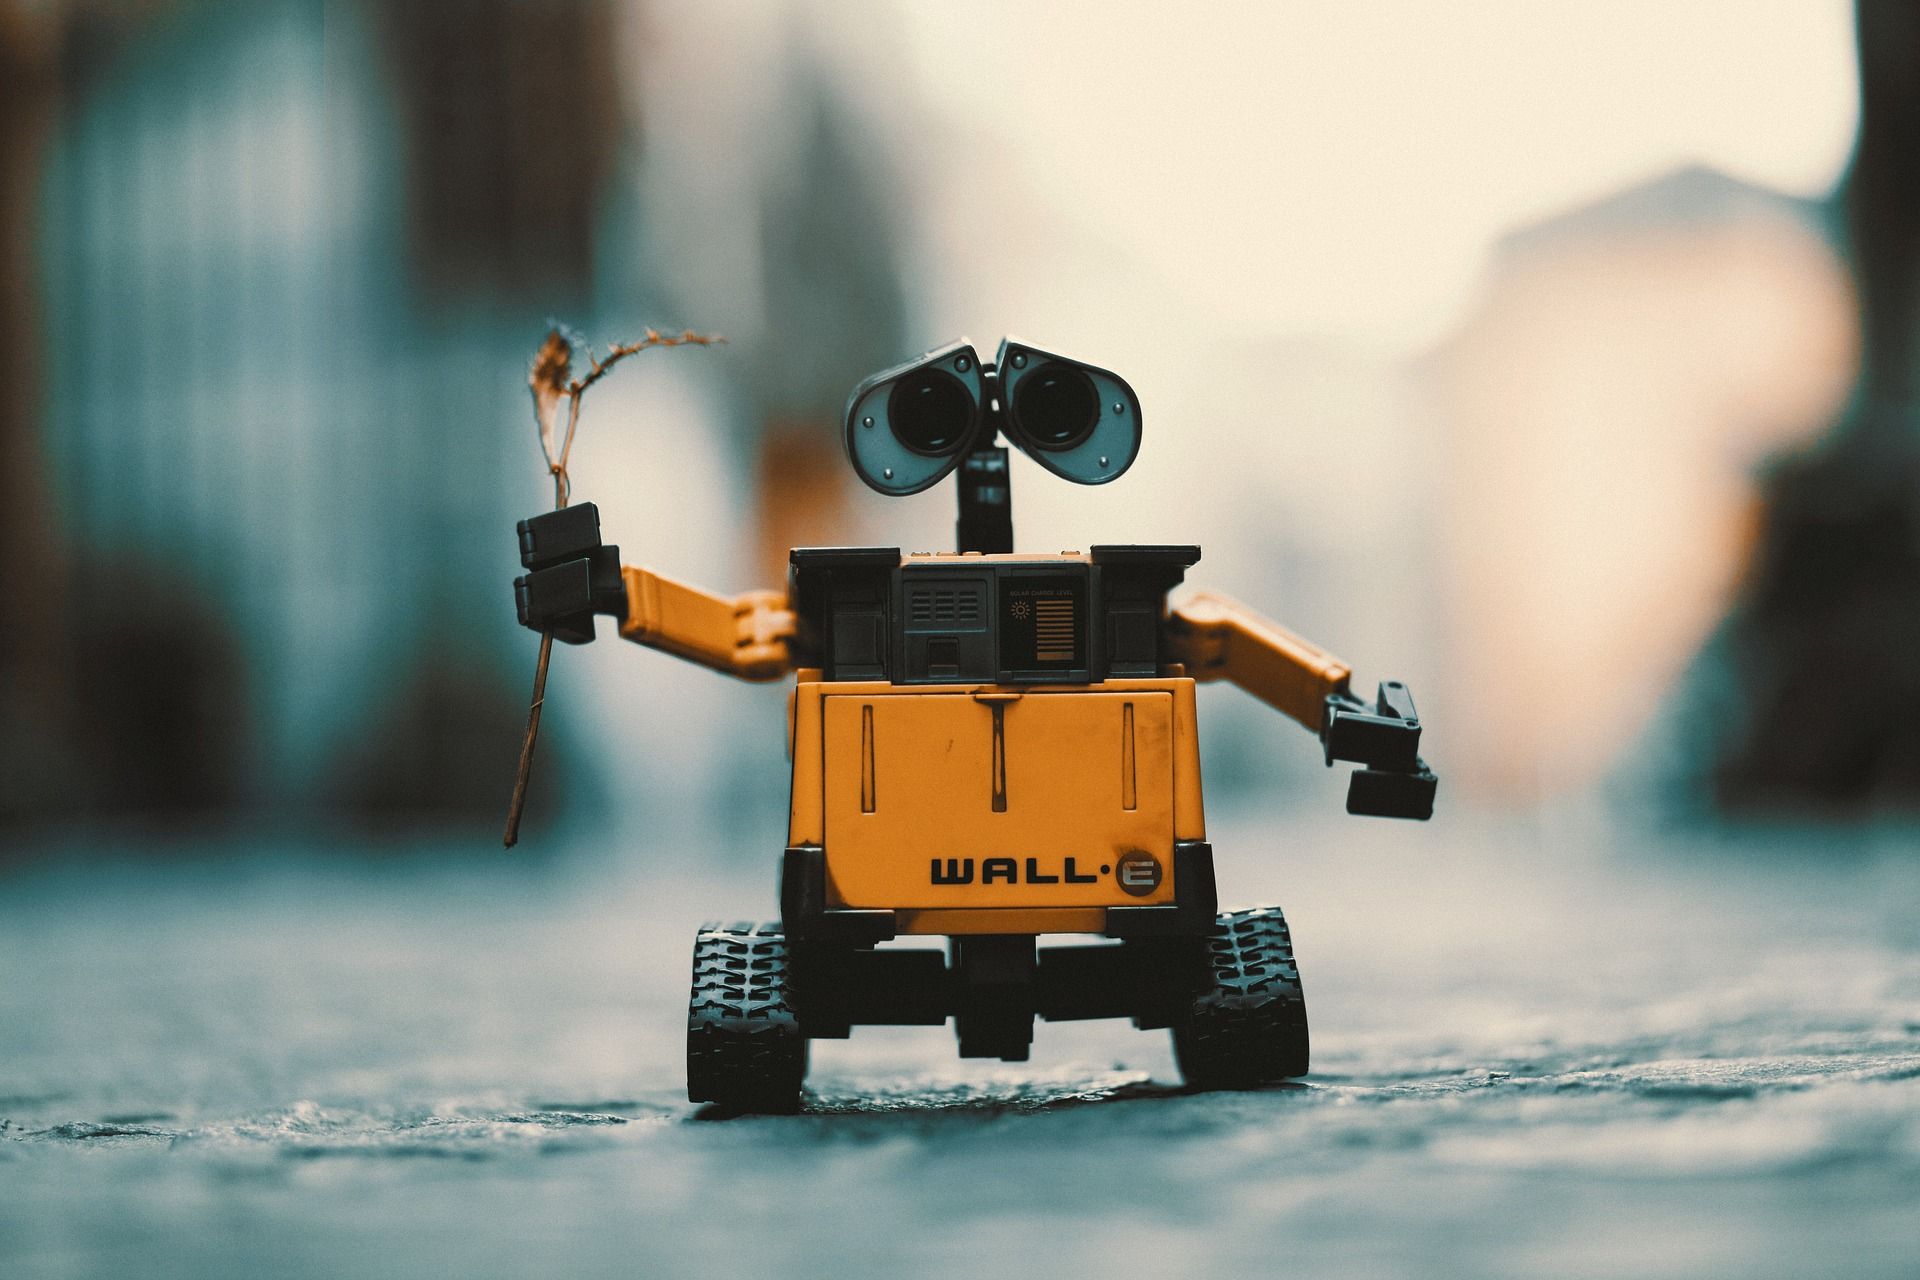 Top 10 de cosas a conocer sobre chatbots o bots conversacionales